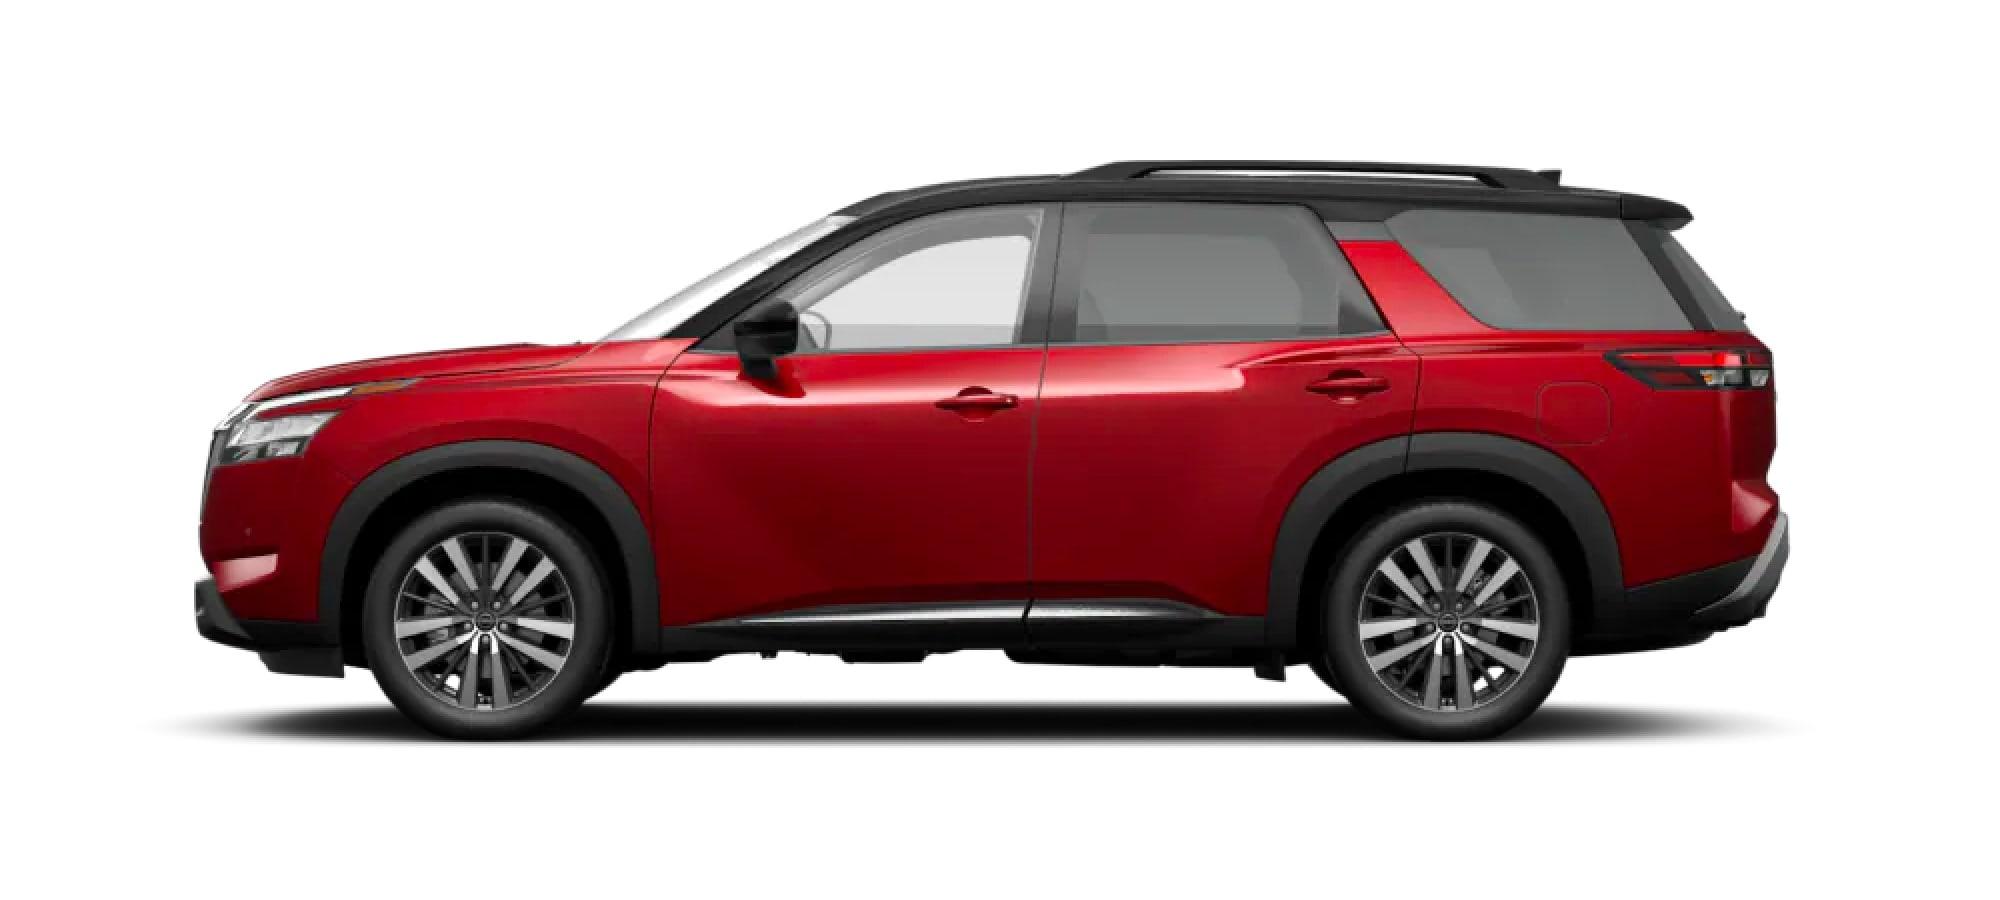 2022 Nissan Pathfinder in Two-Tone Scarlet Ember Tintcoat / Super Black